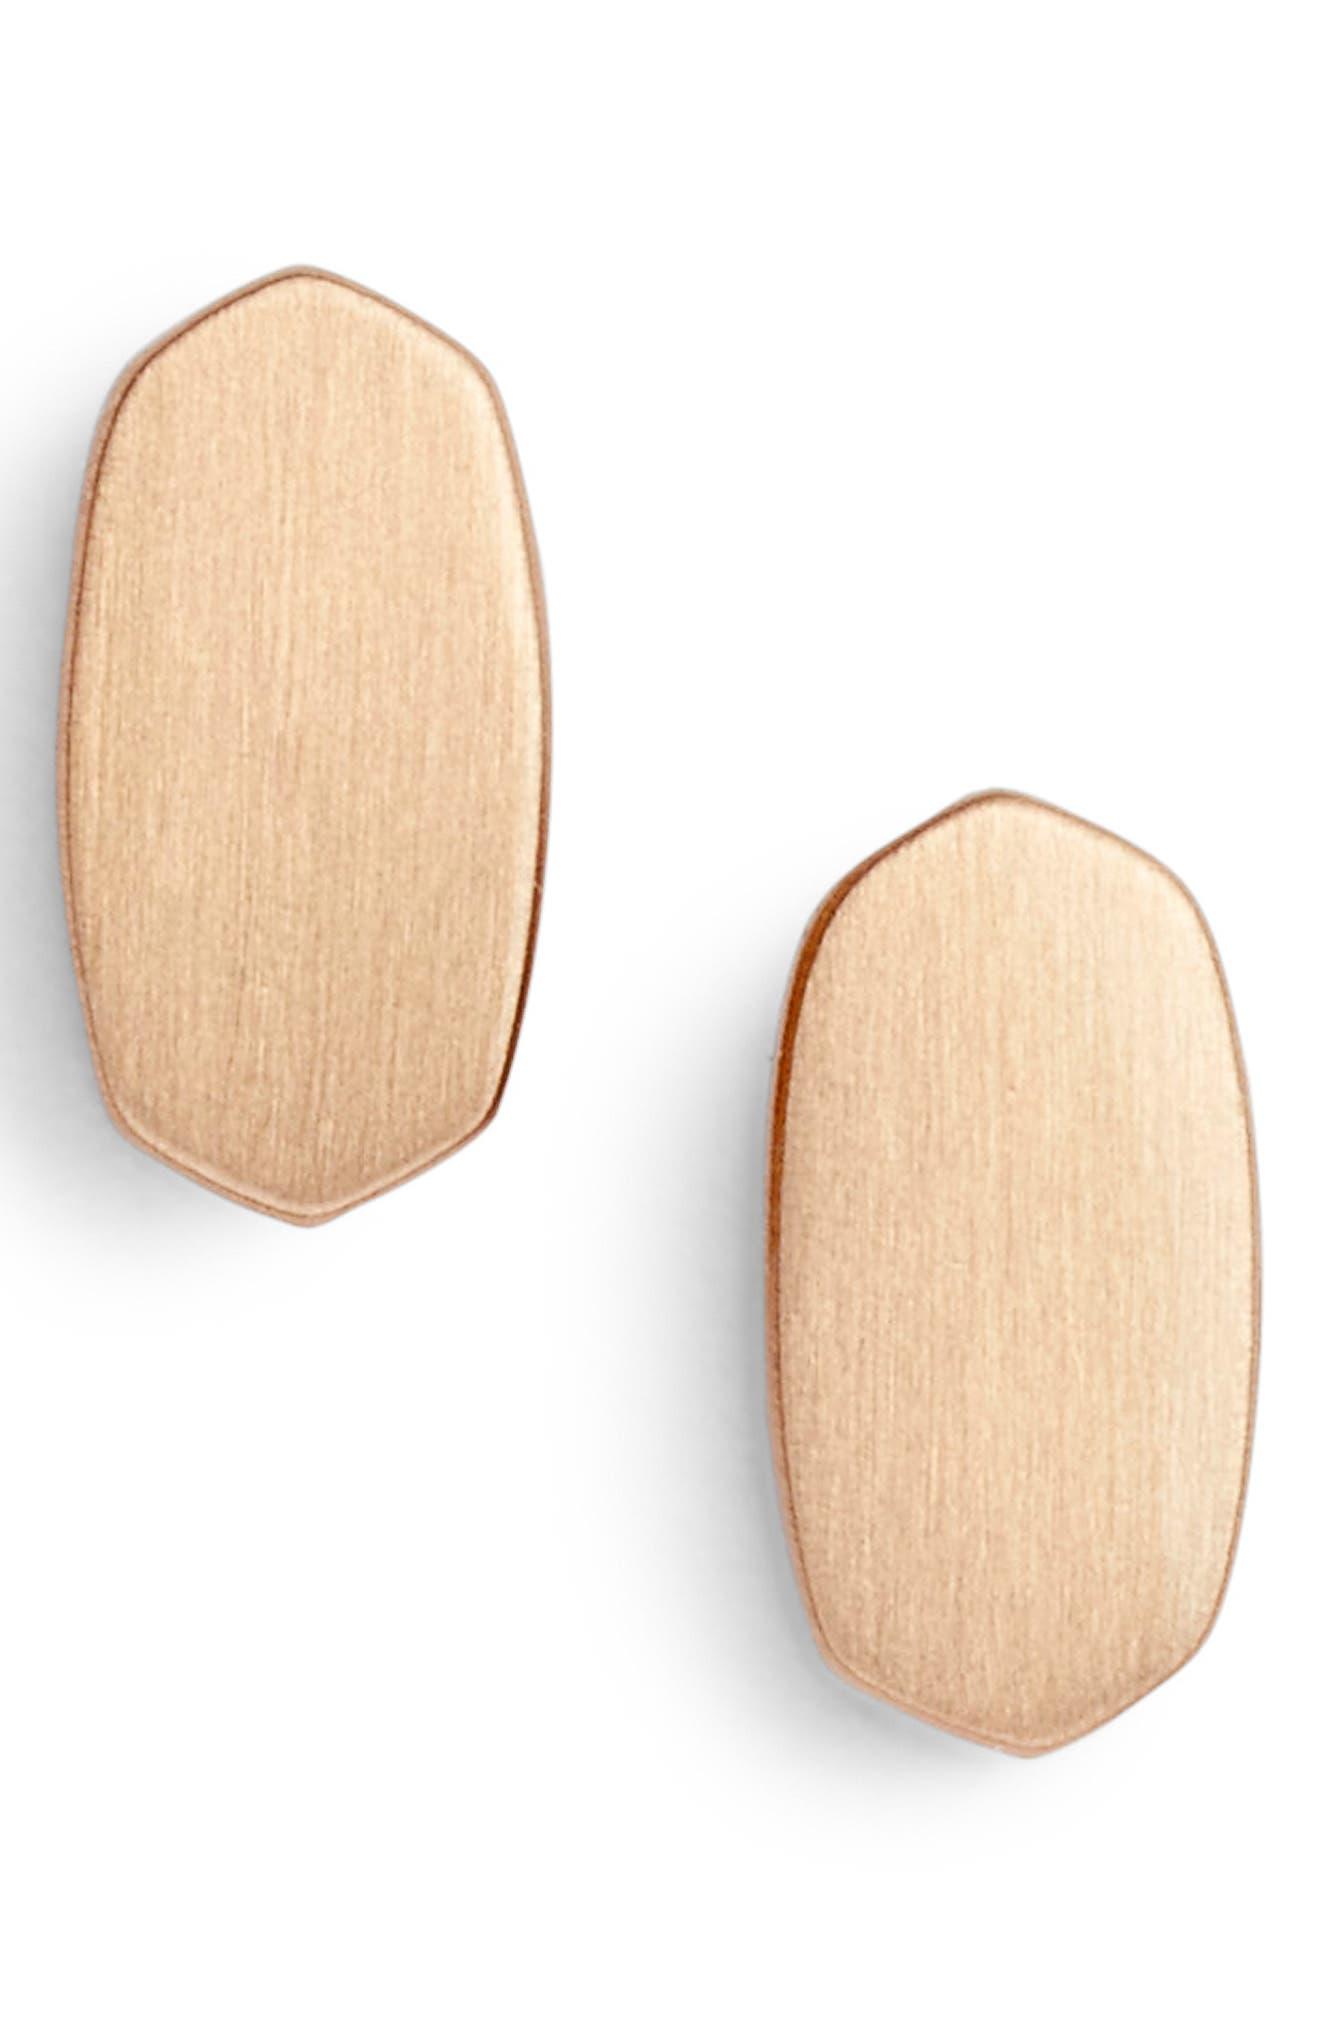 Alternate Image 1 Selected - Kendra Scott Barrett Stud Earrings